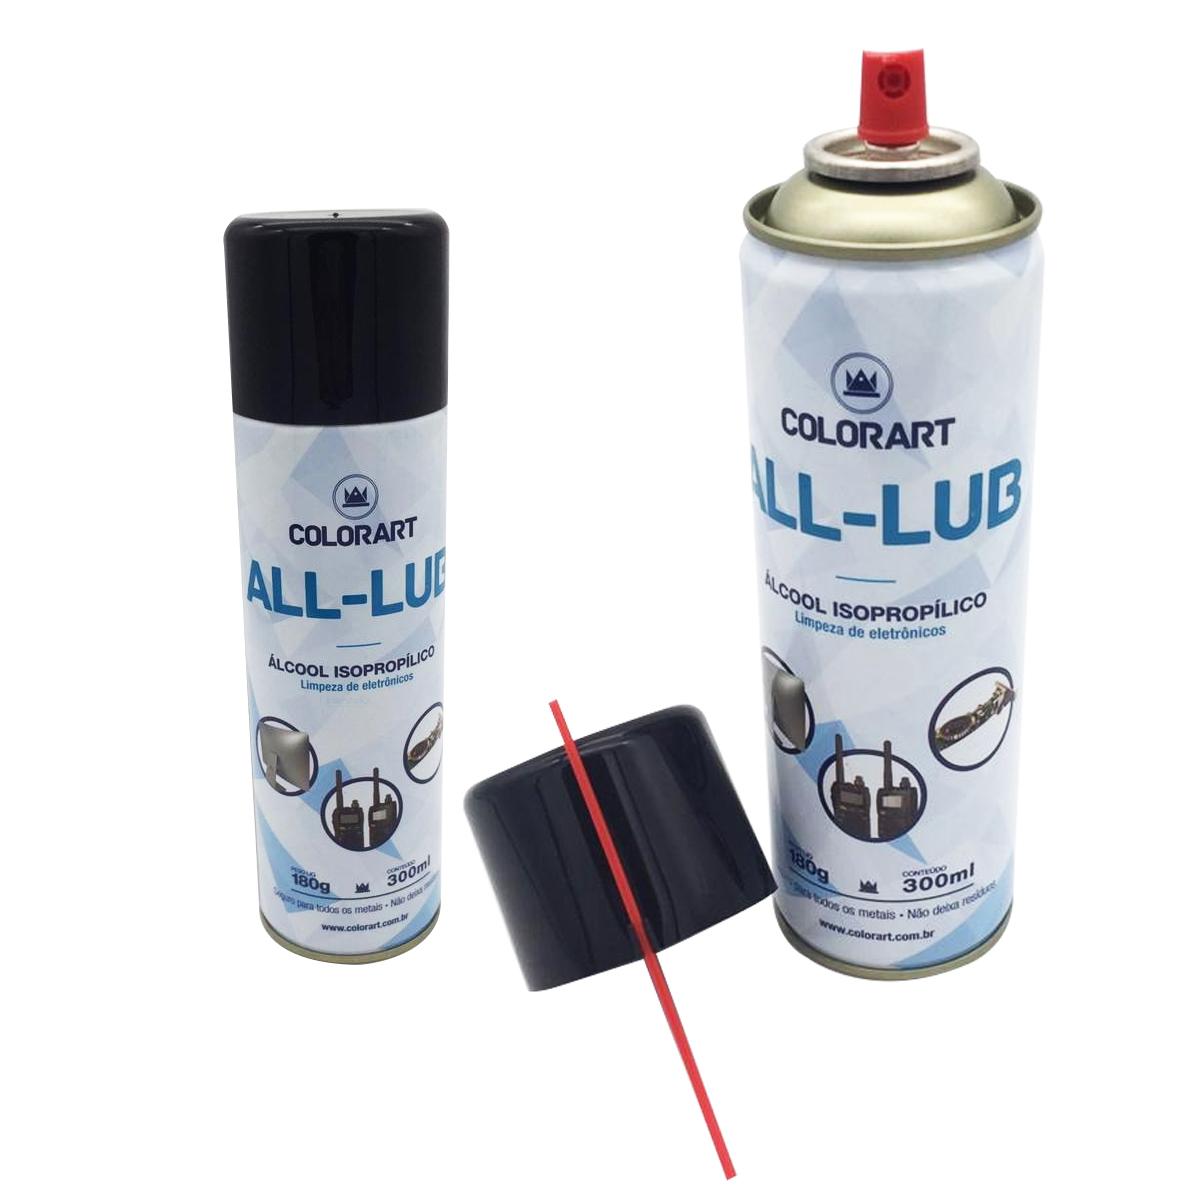 Spray Álcool Isopropílico Limeza Eletronicos Celular 300ml